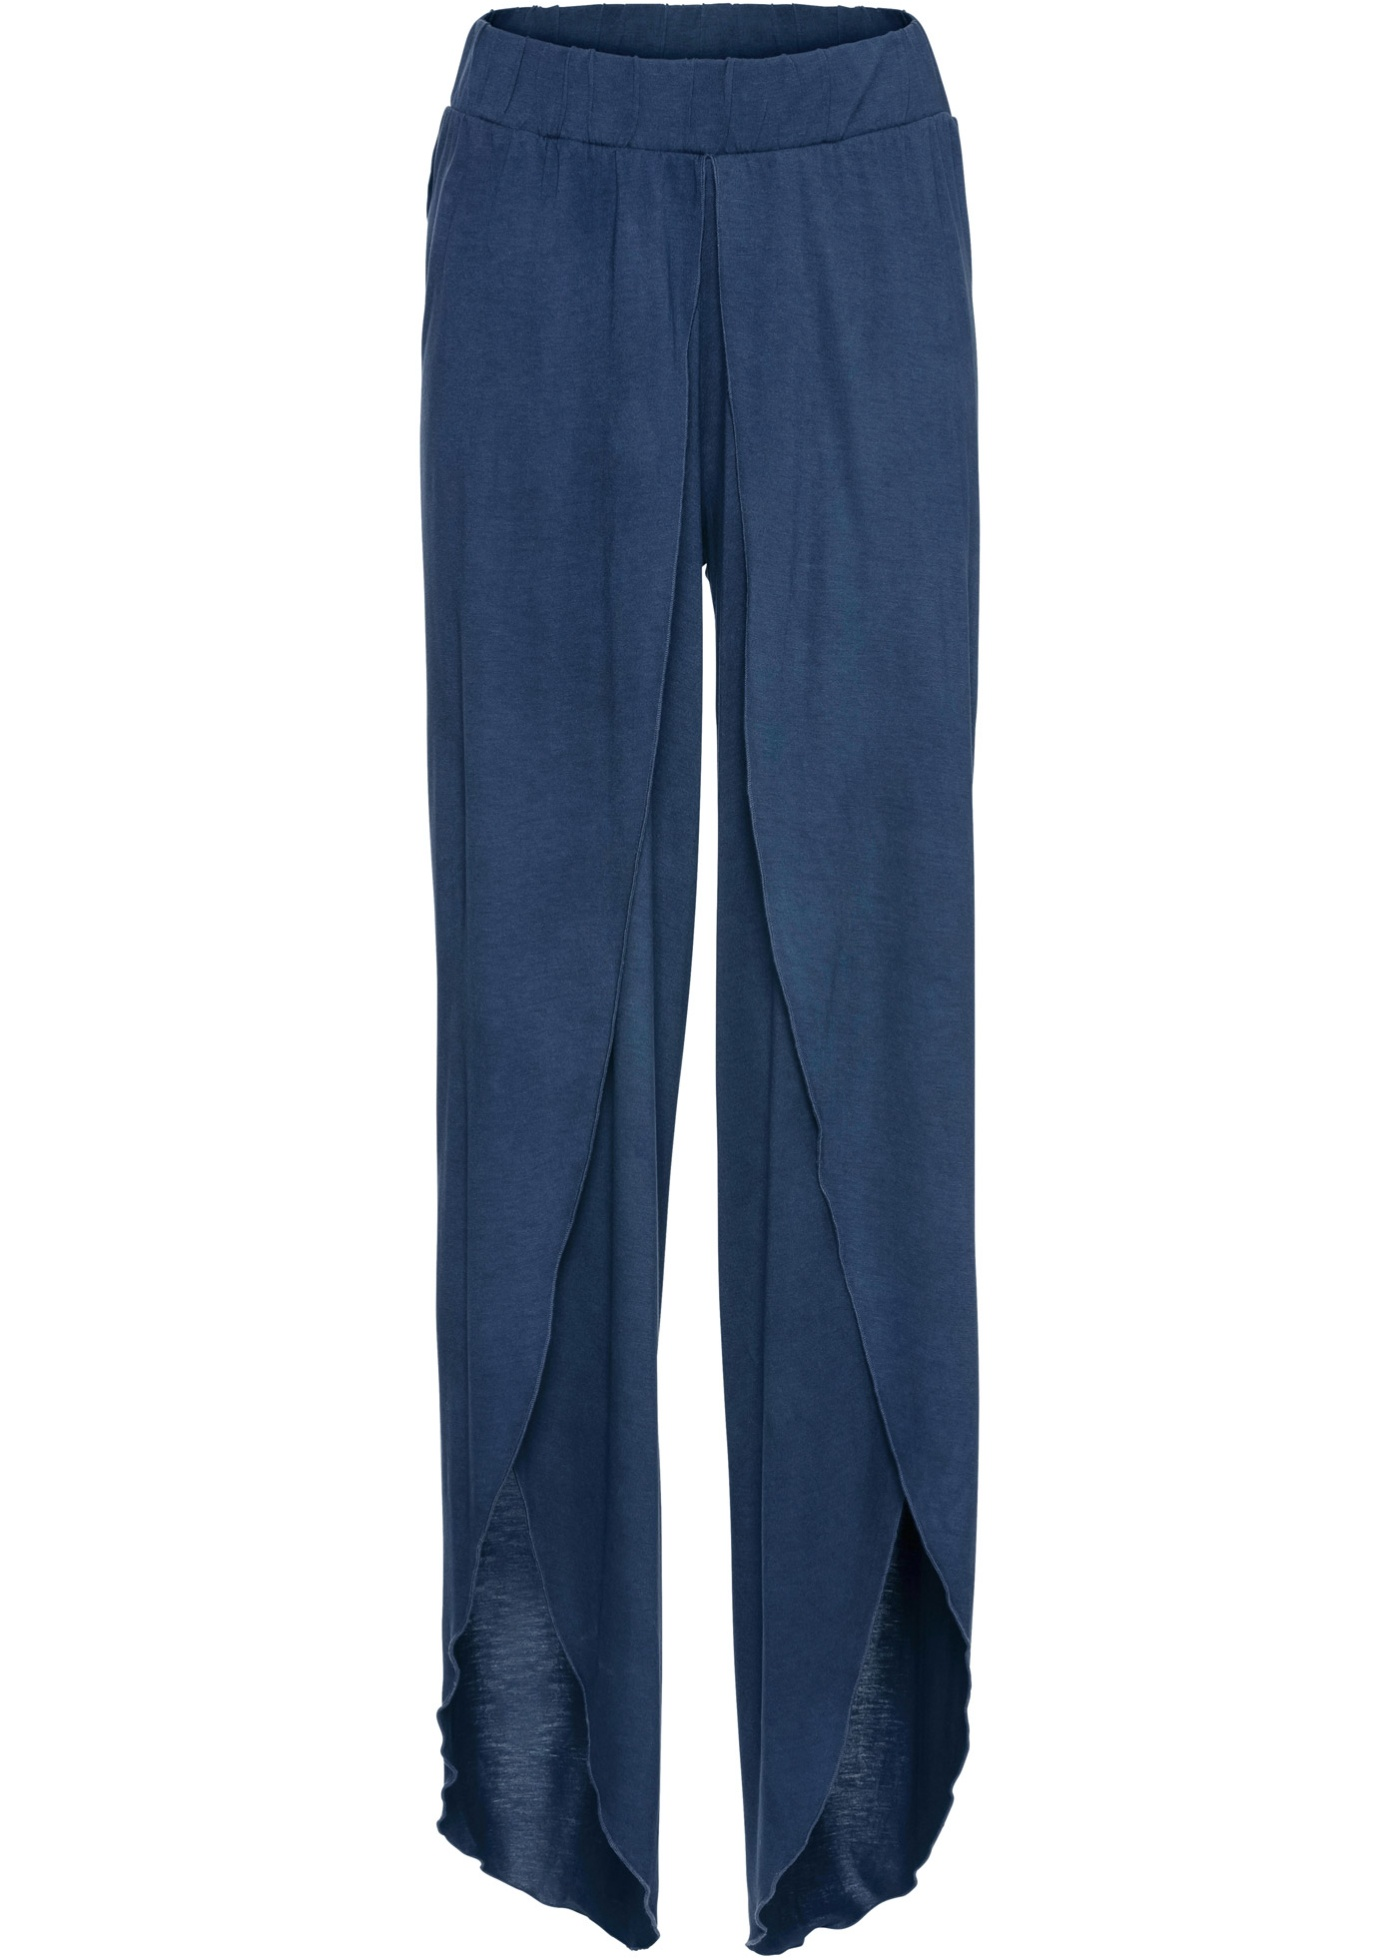 Pantalon style portefeuille